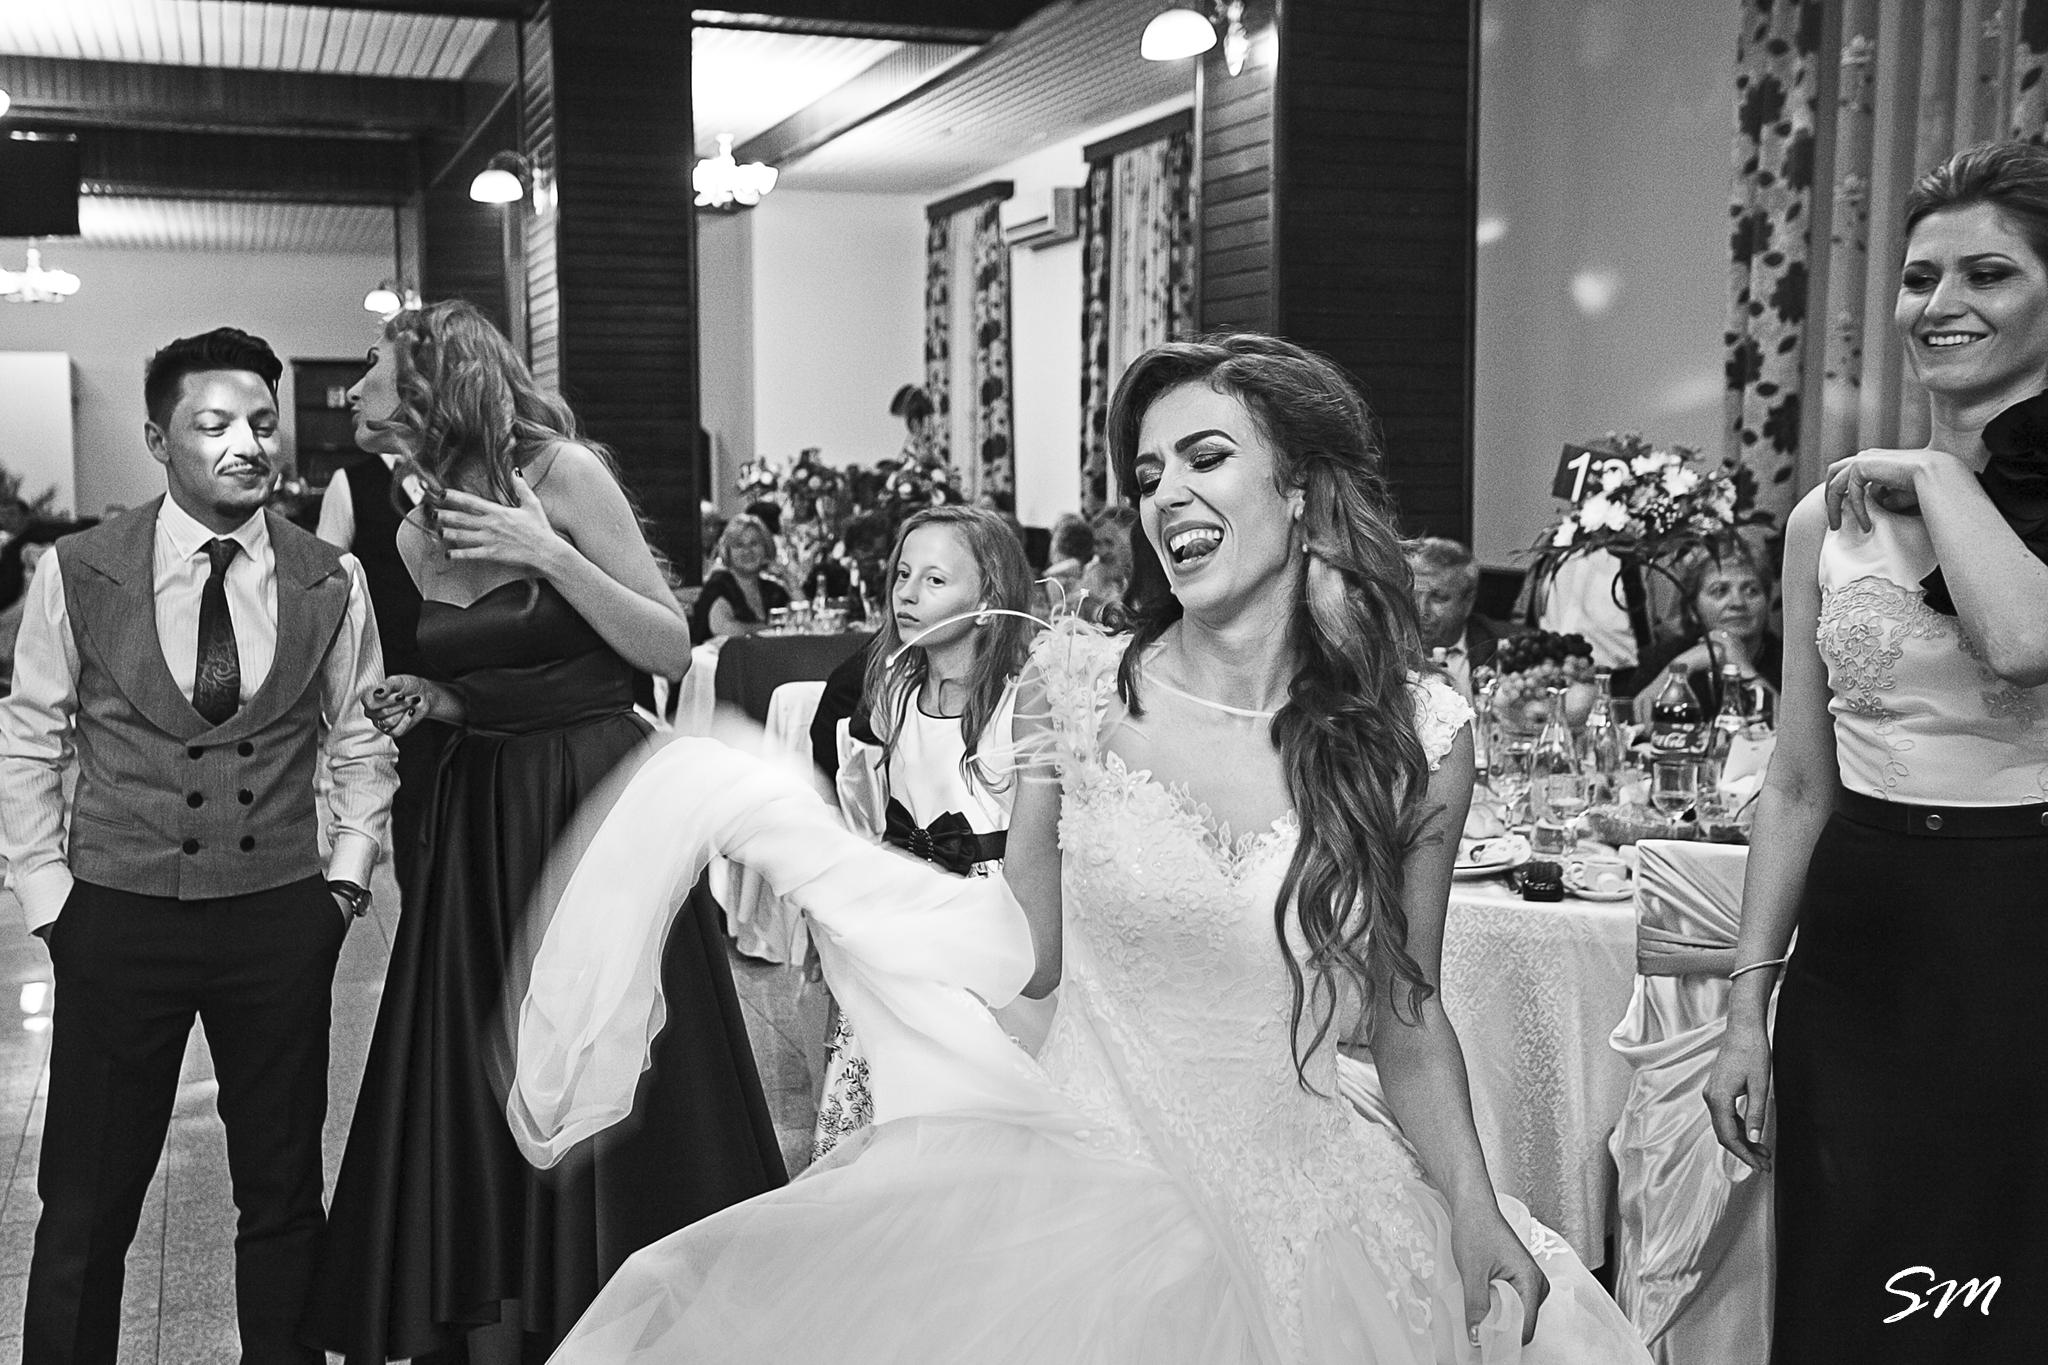 fotograf_nunta_profesionist_suceava (32)